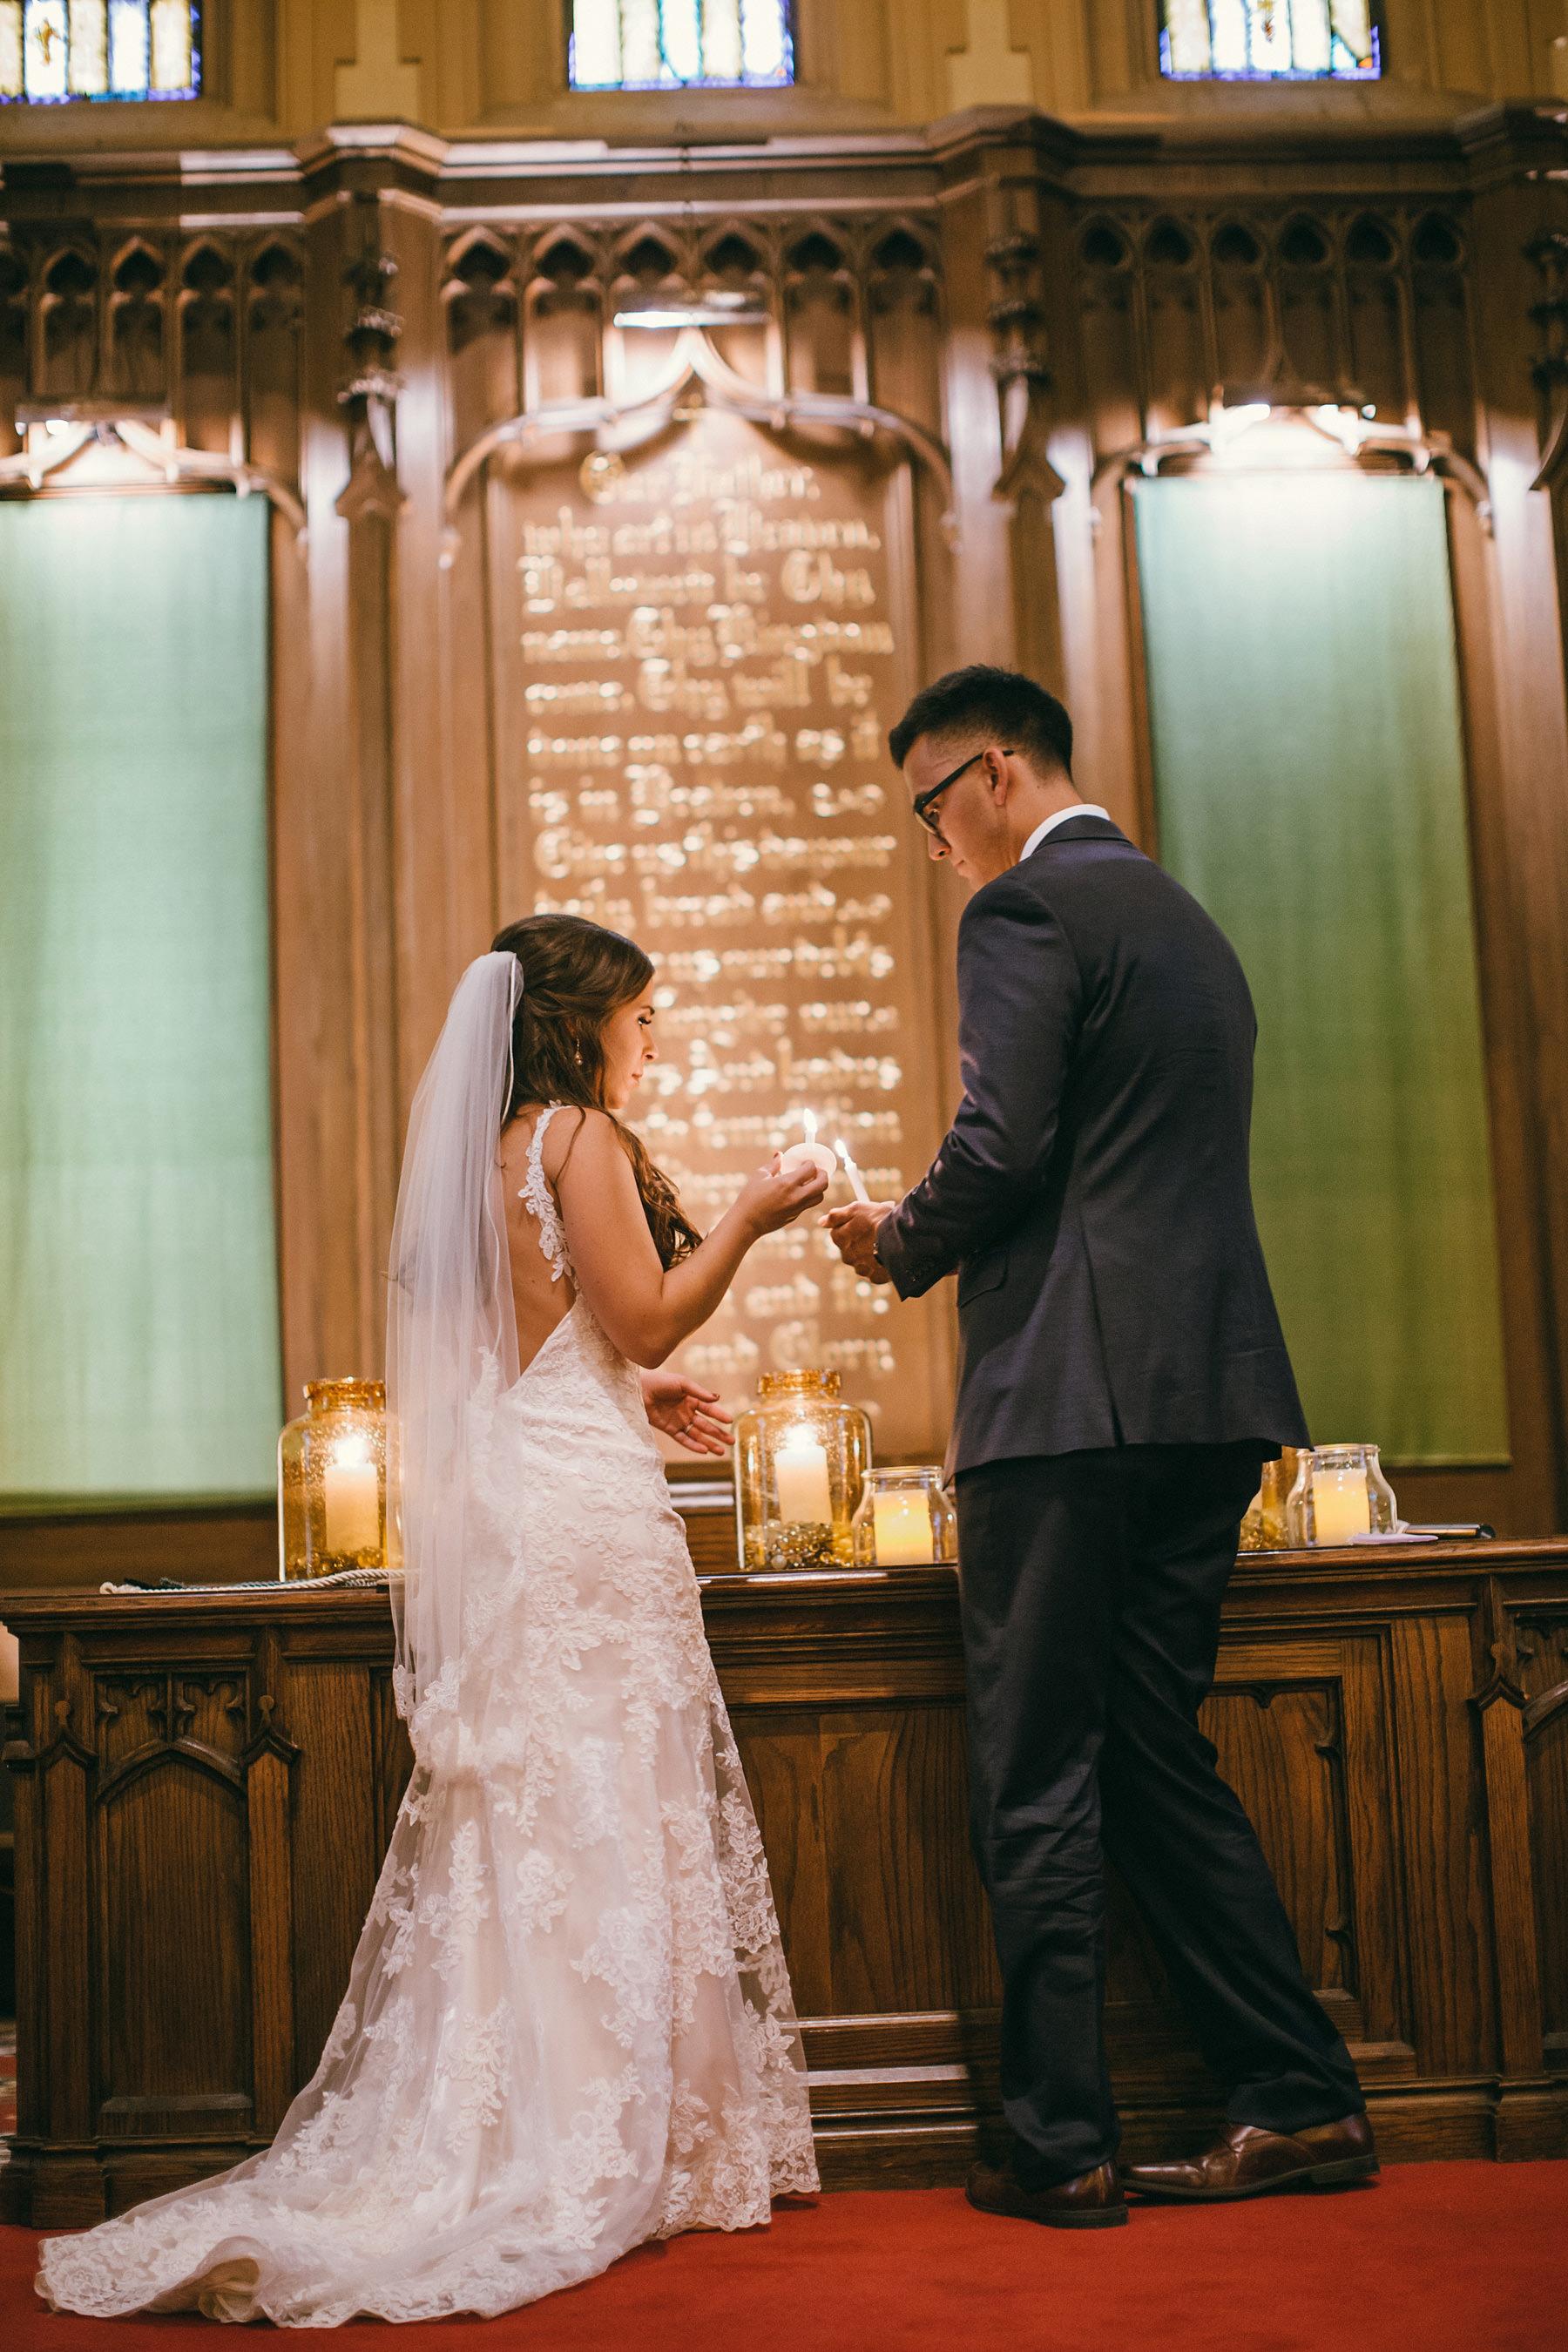 Kansas City Summer Wedding at the Guild_Kindling Wedding Photography Blog53.JPG